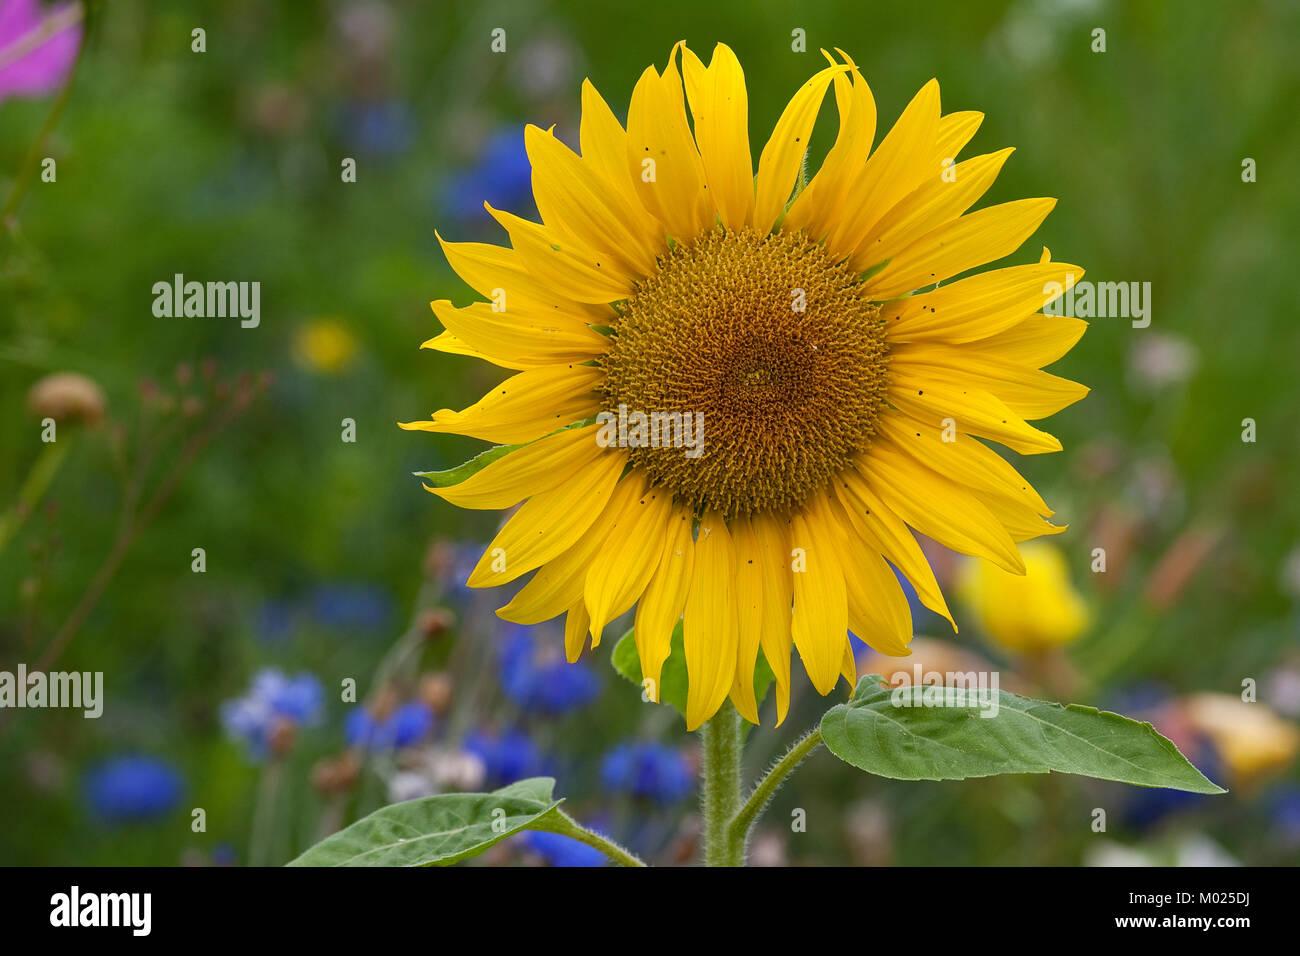 Sonnenblume, Sonnenblumen, Helianthus annuus, Common Sunflower - Stock Image